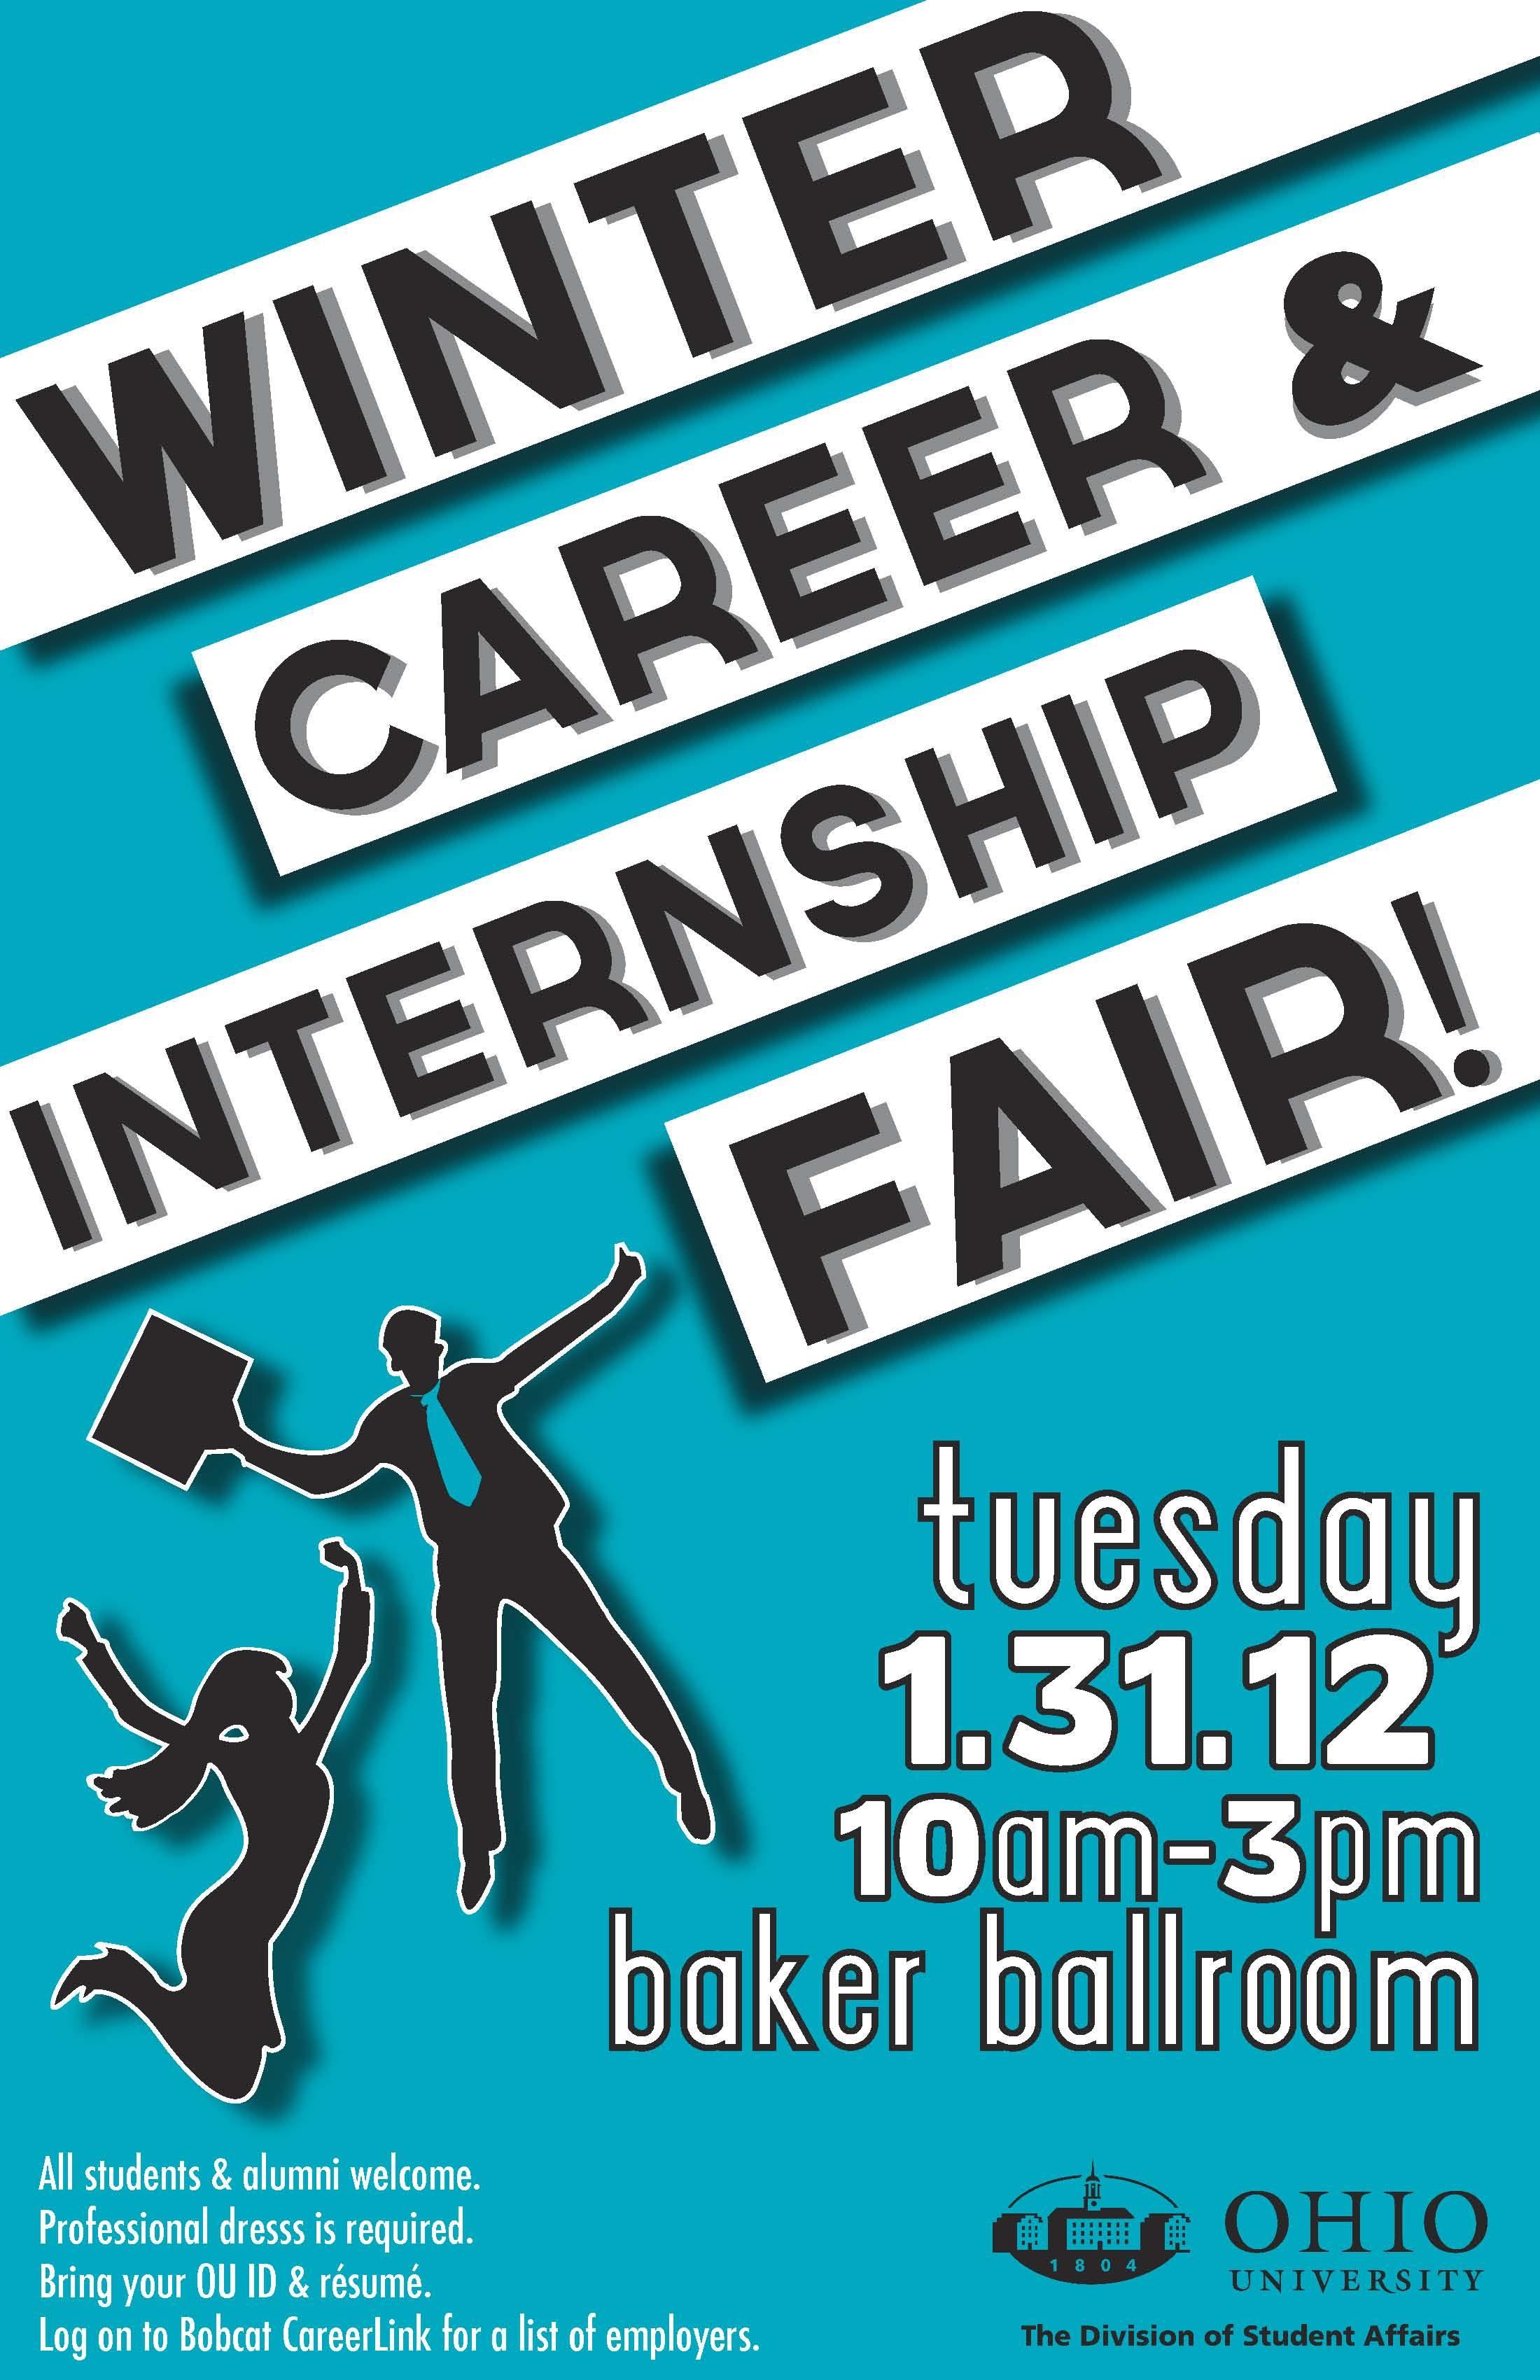 Winter Career Fair Poster copy